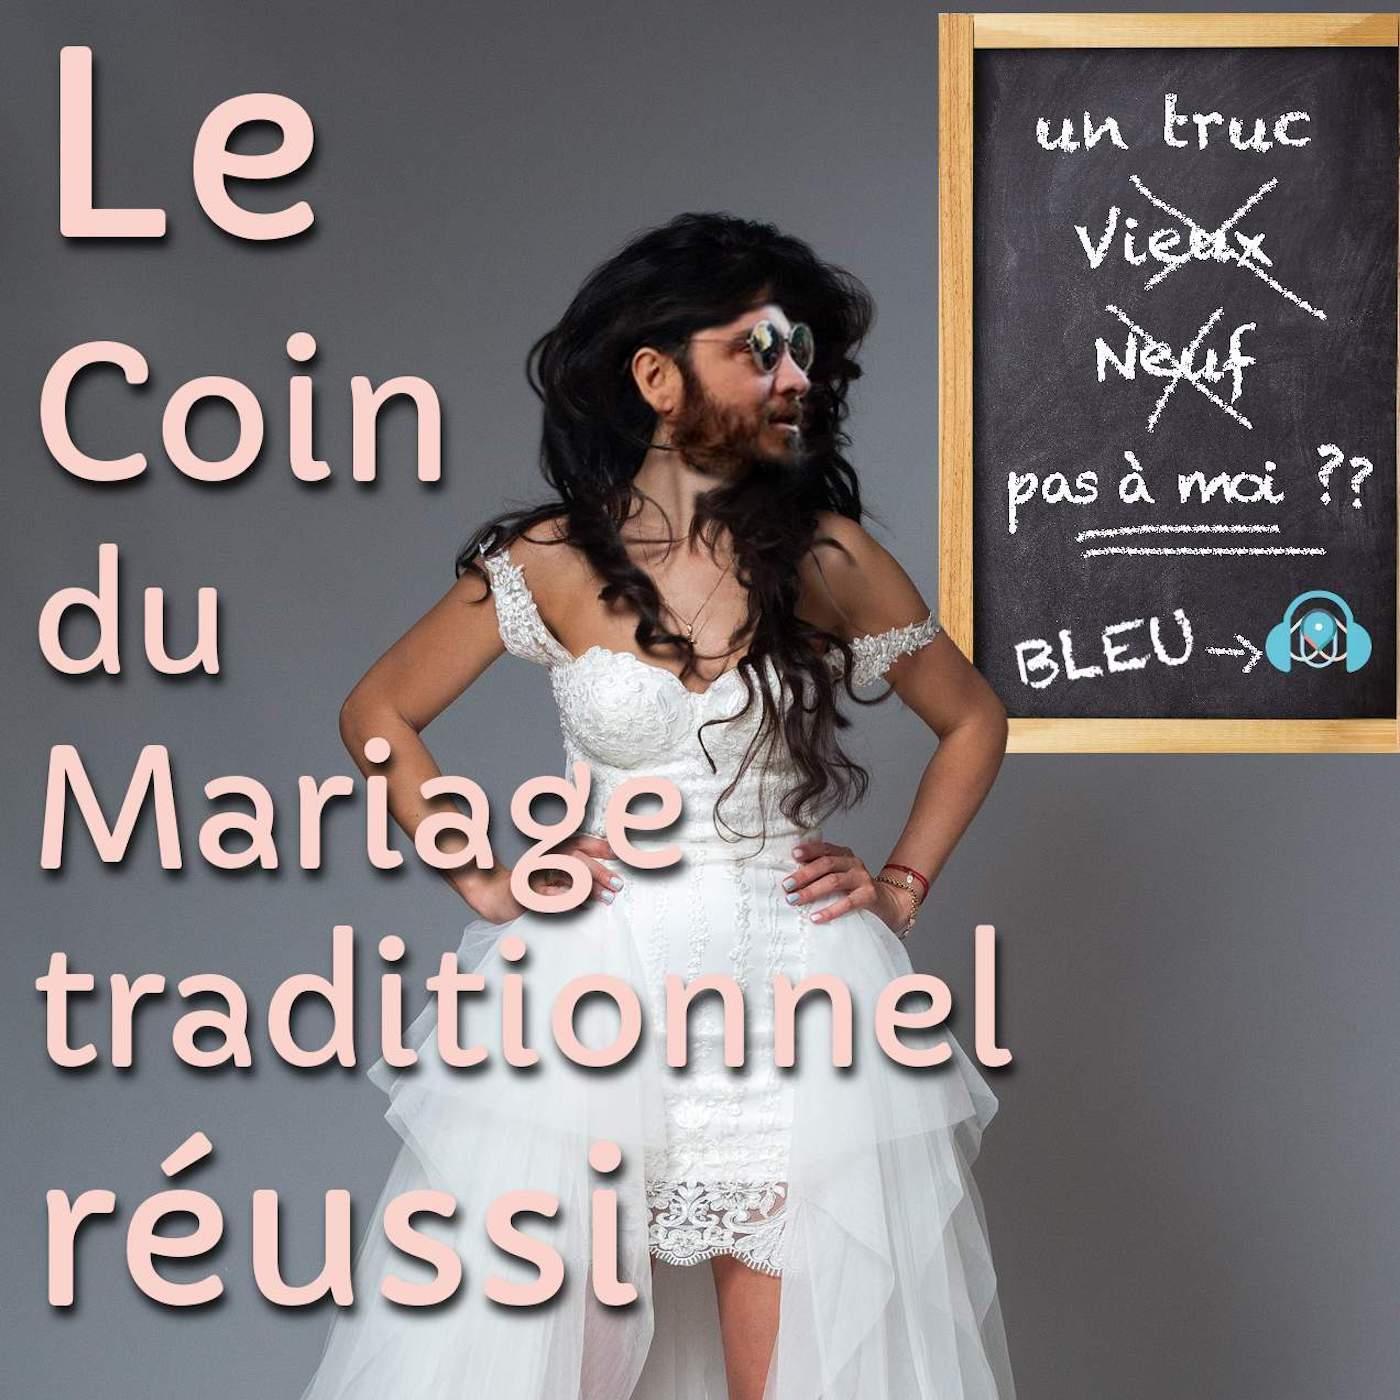 LE COIN DU MARIAGE TRADITIONNEL RÉUSSI S1E21 - C_era una volta il West